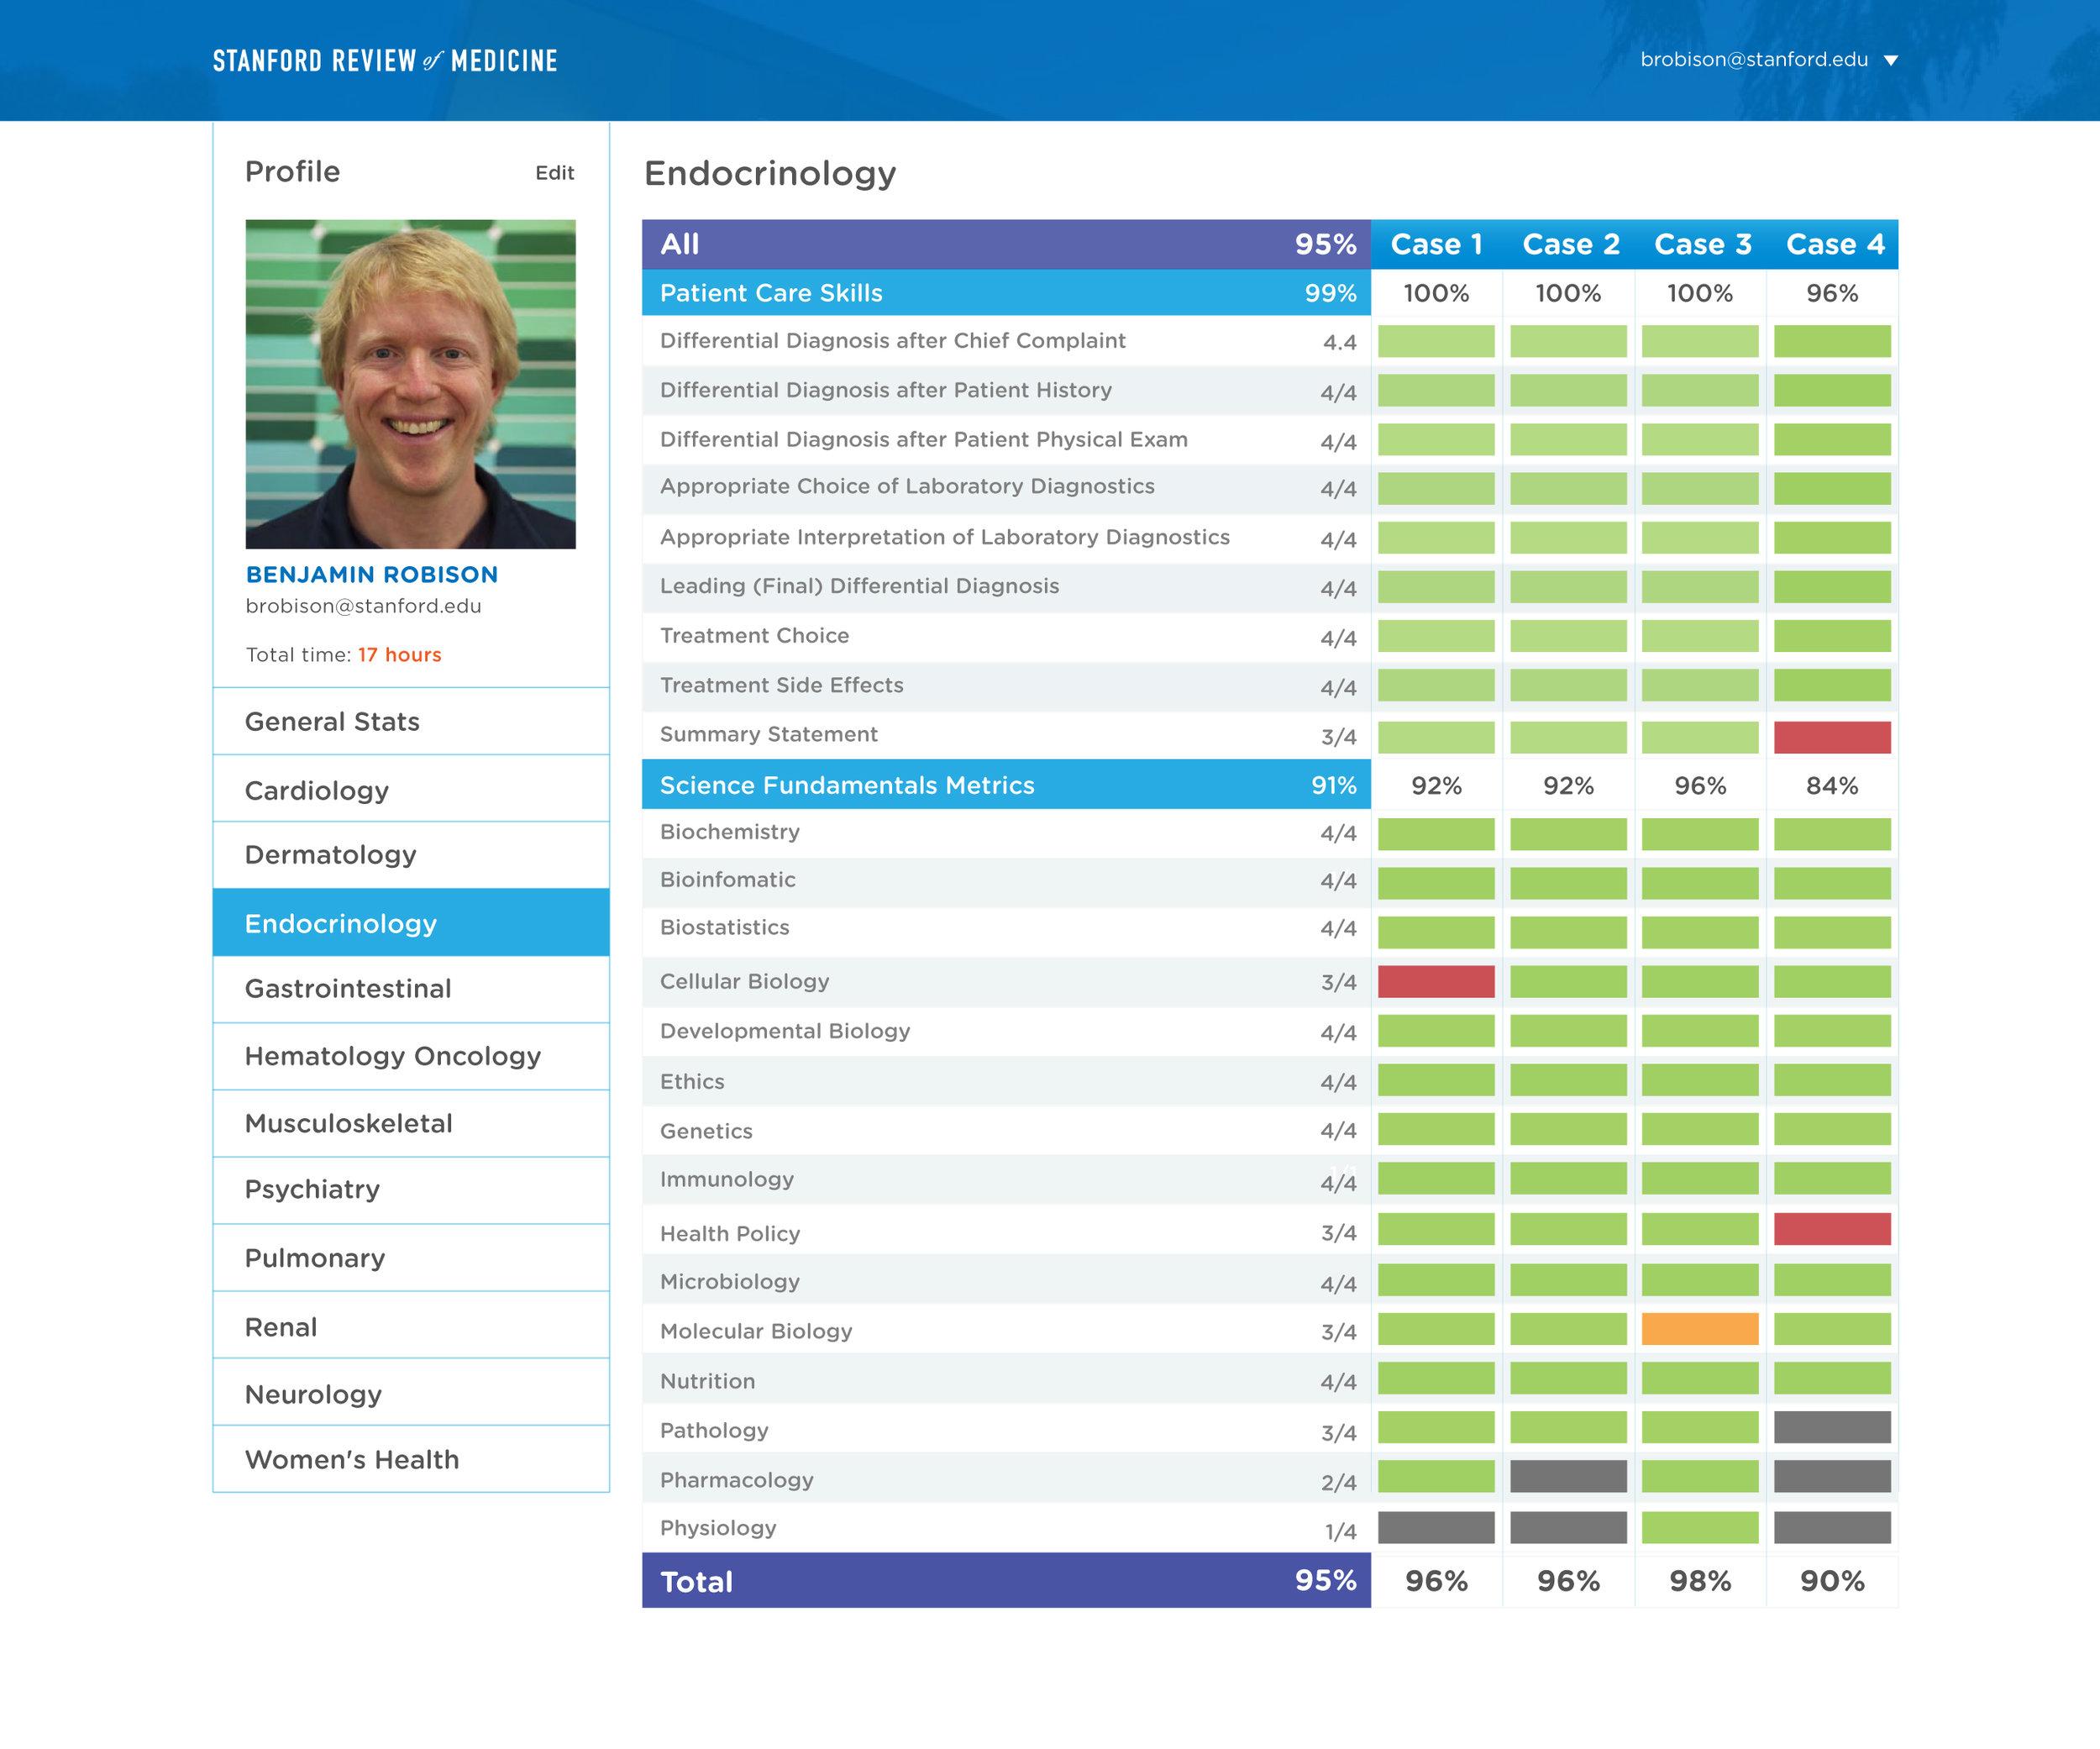 srm-laptop-07-user-profile-2-endocrinology.jpg